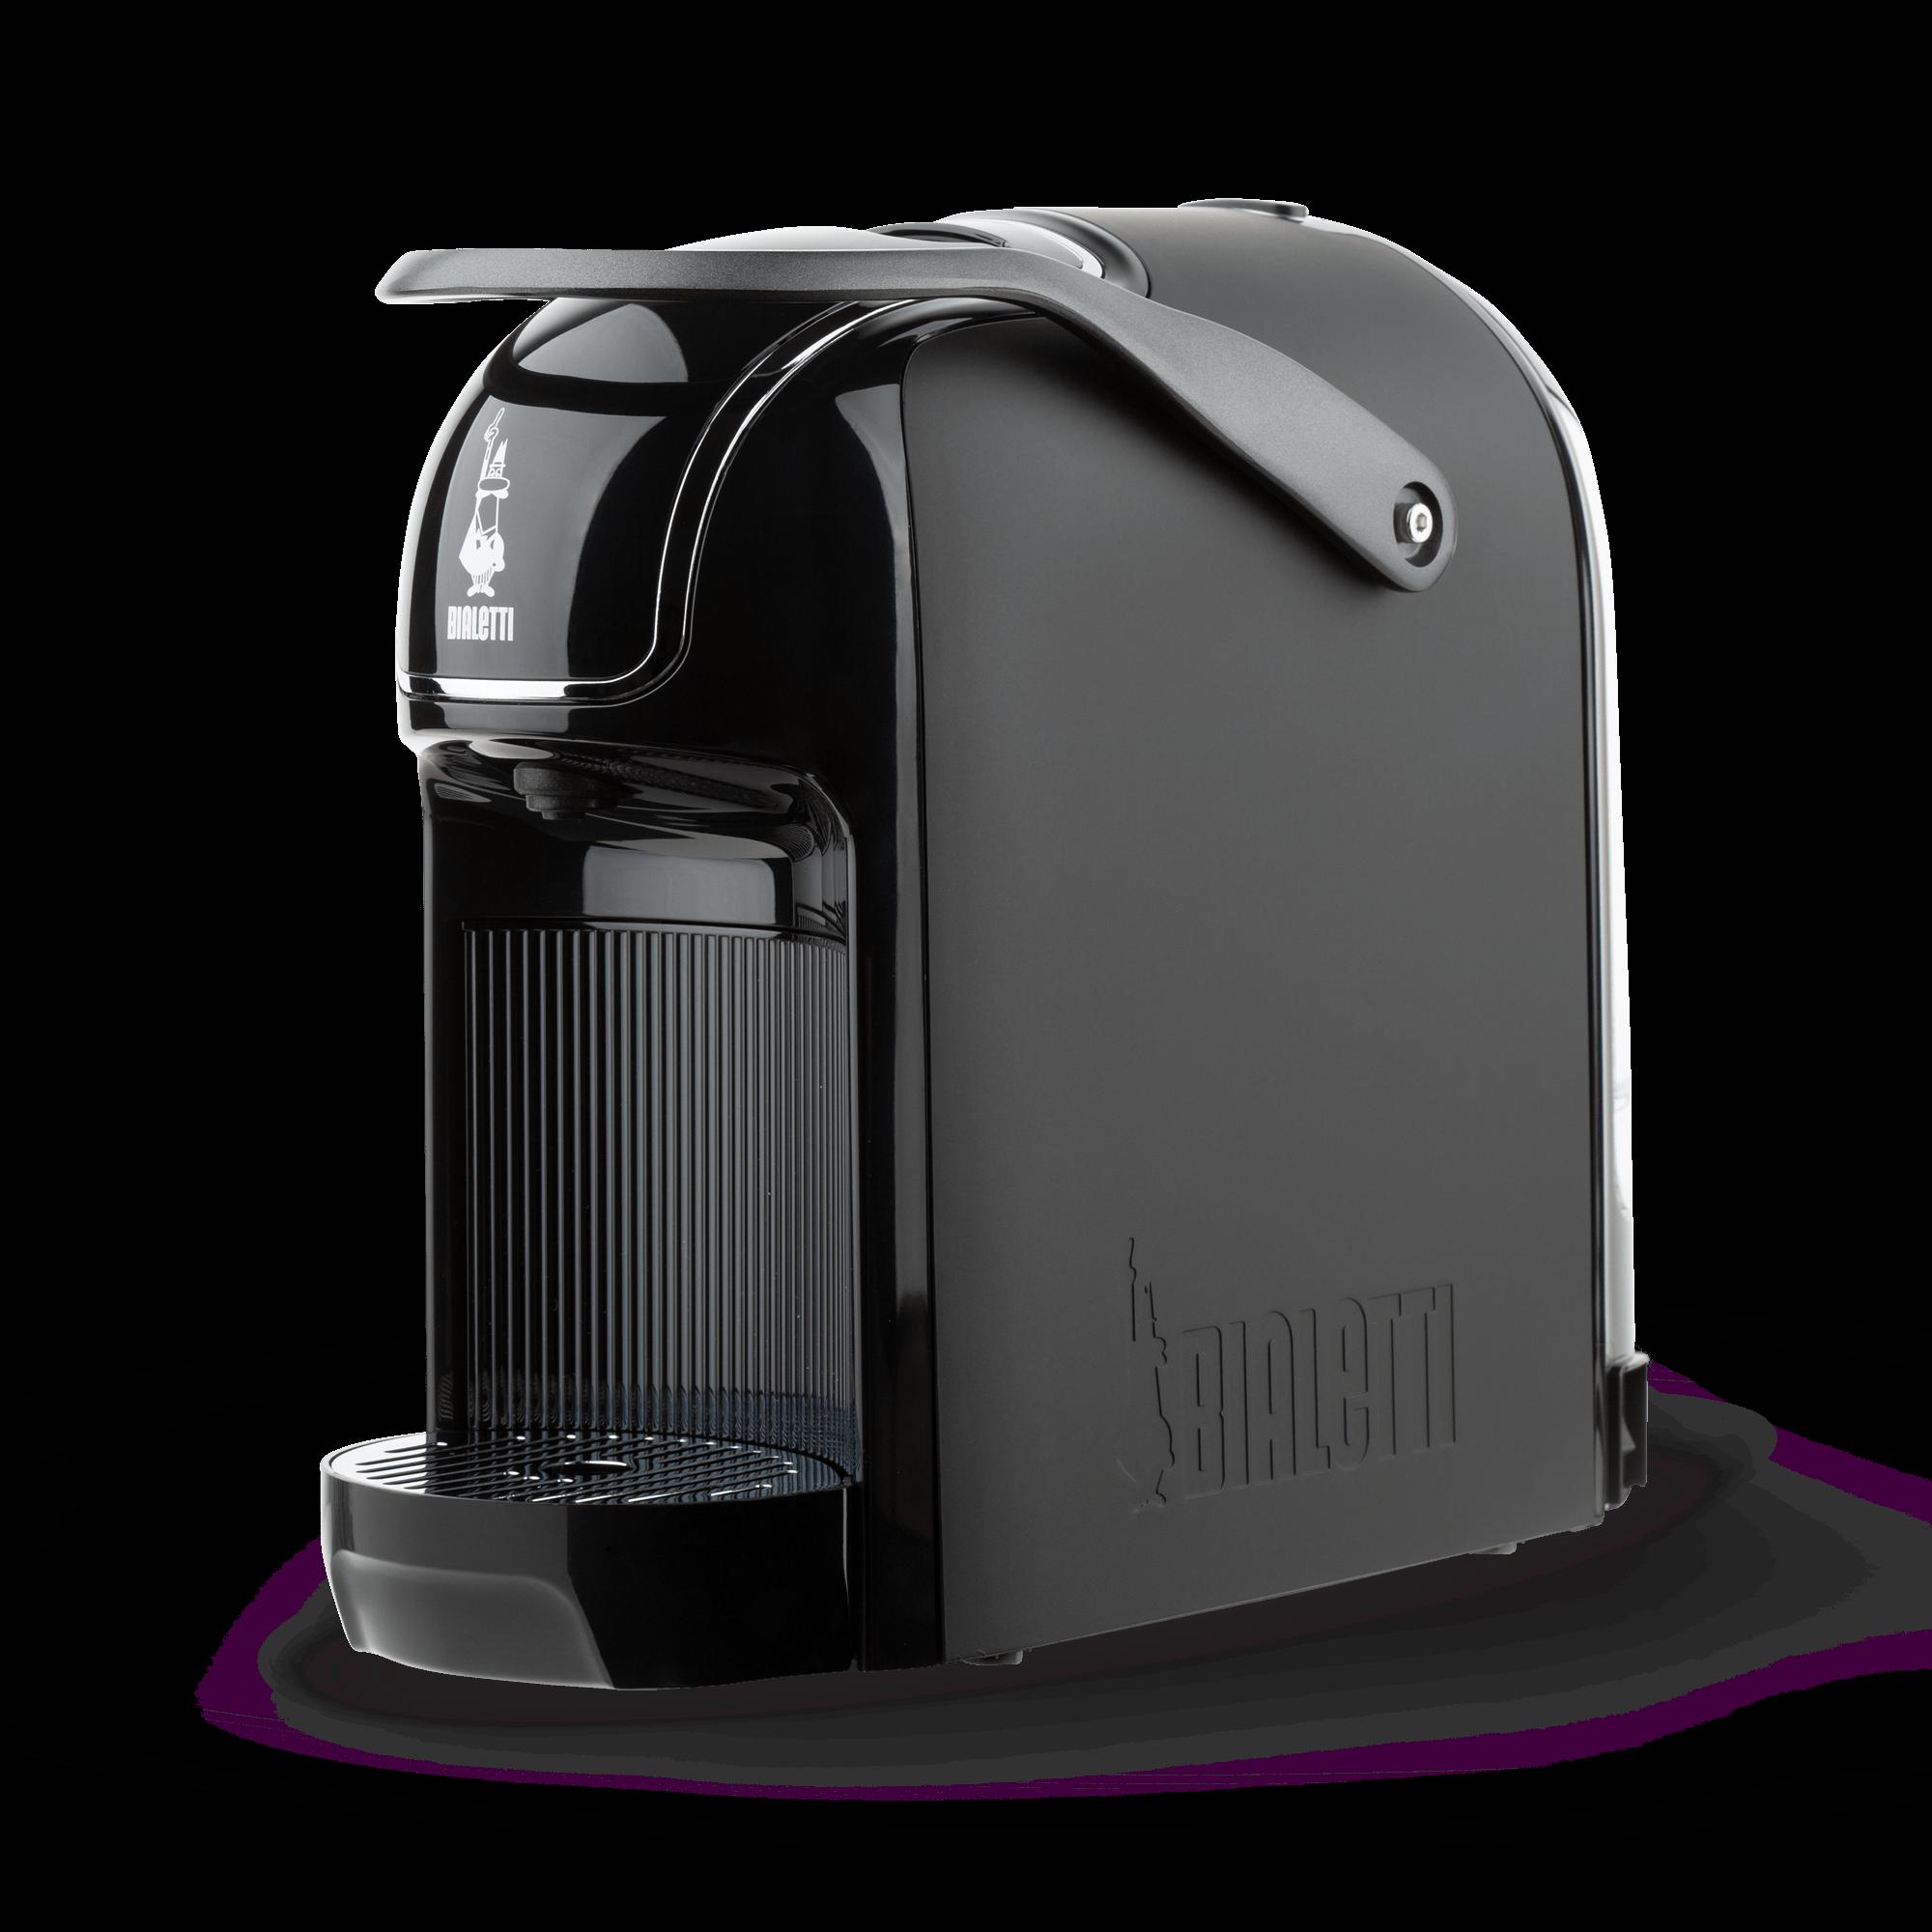 Bialetti - Break Automatica Capsules Espressomachine - Black (80060)